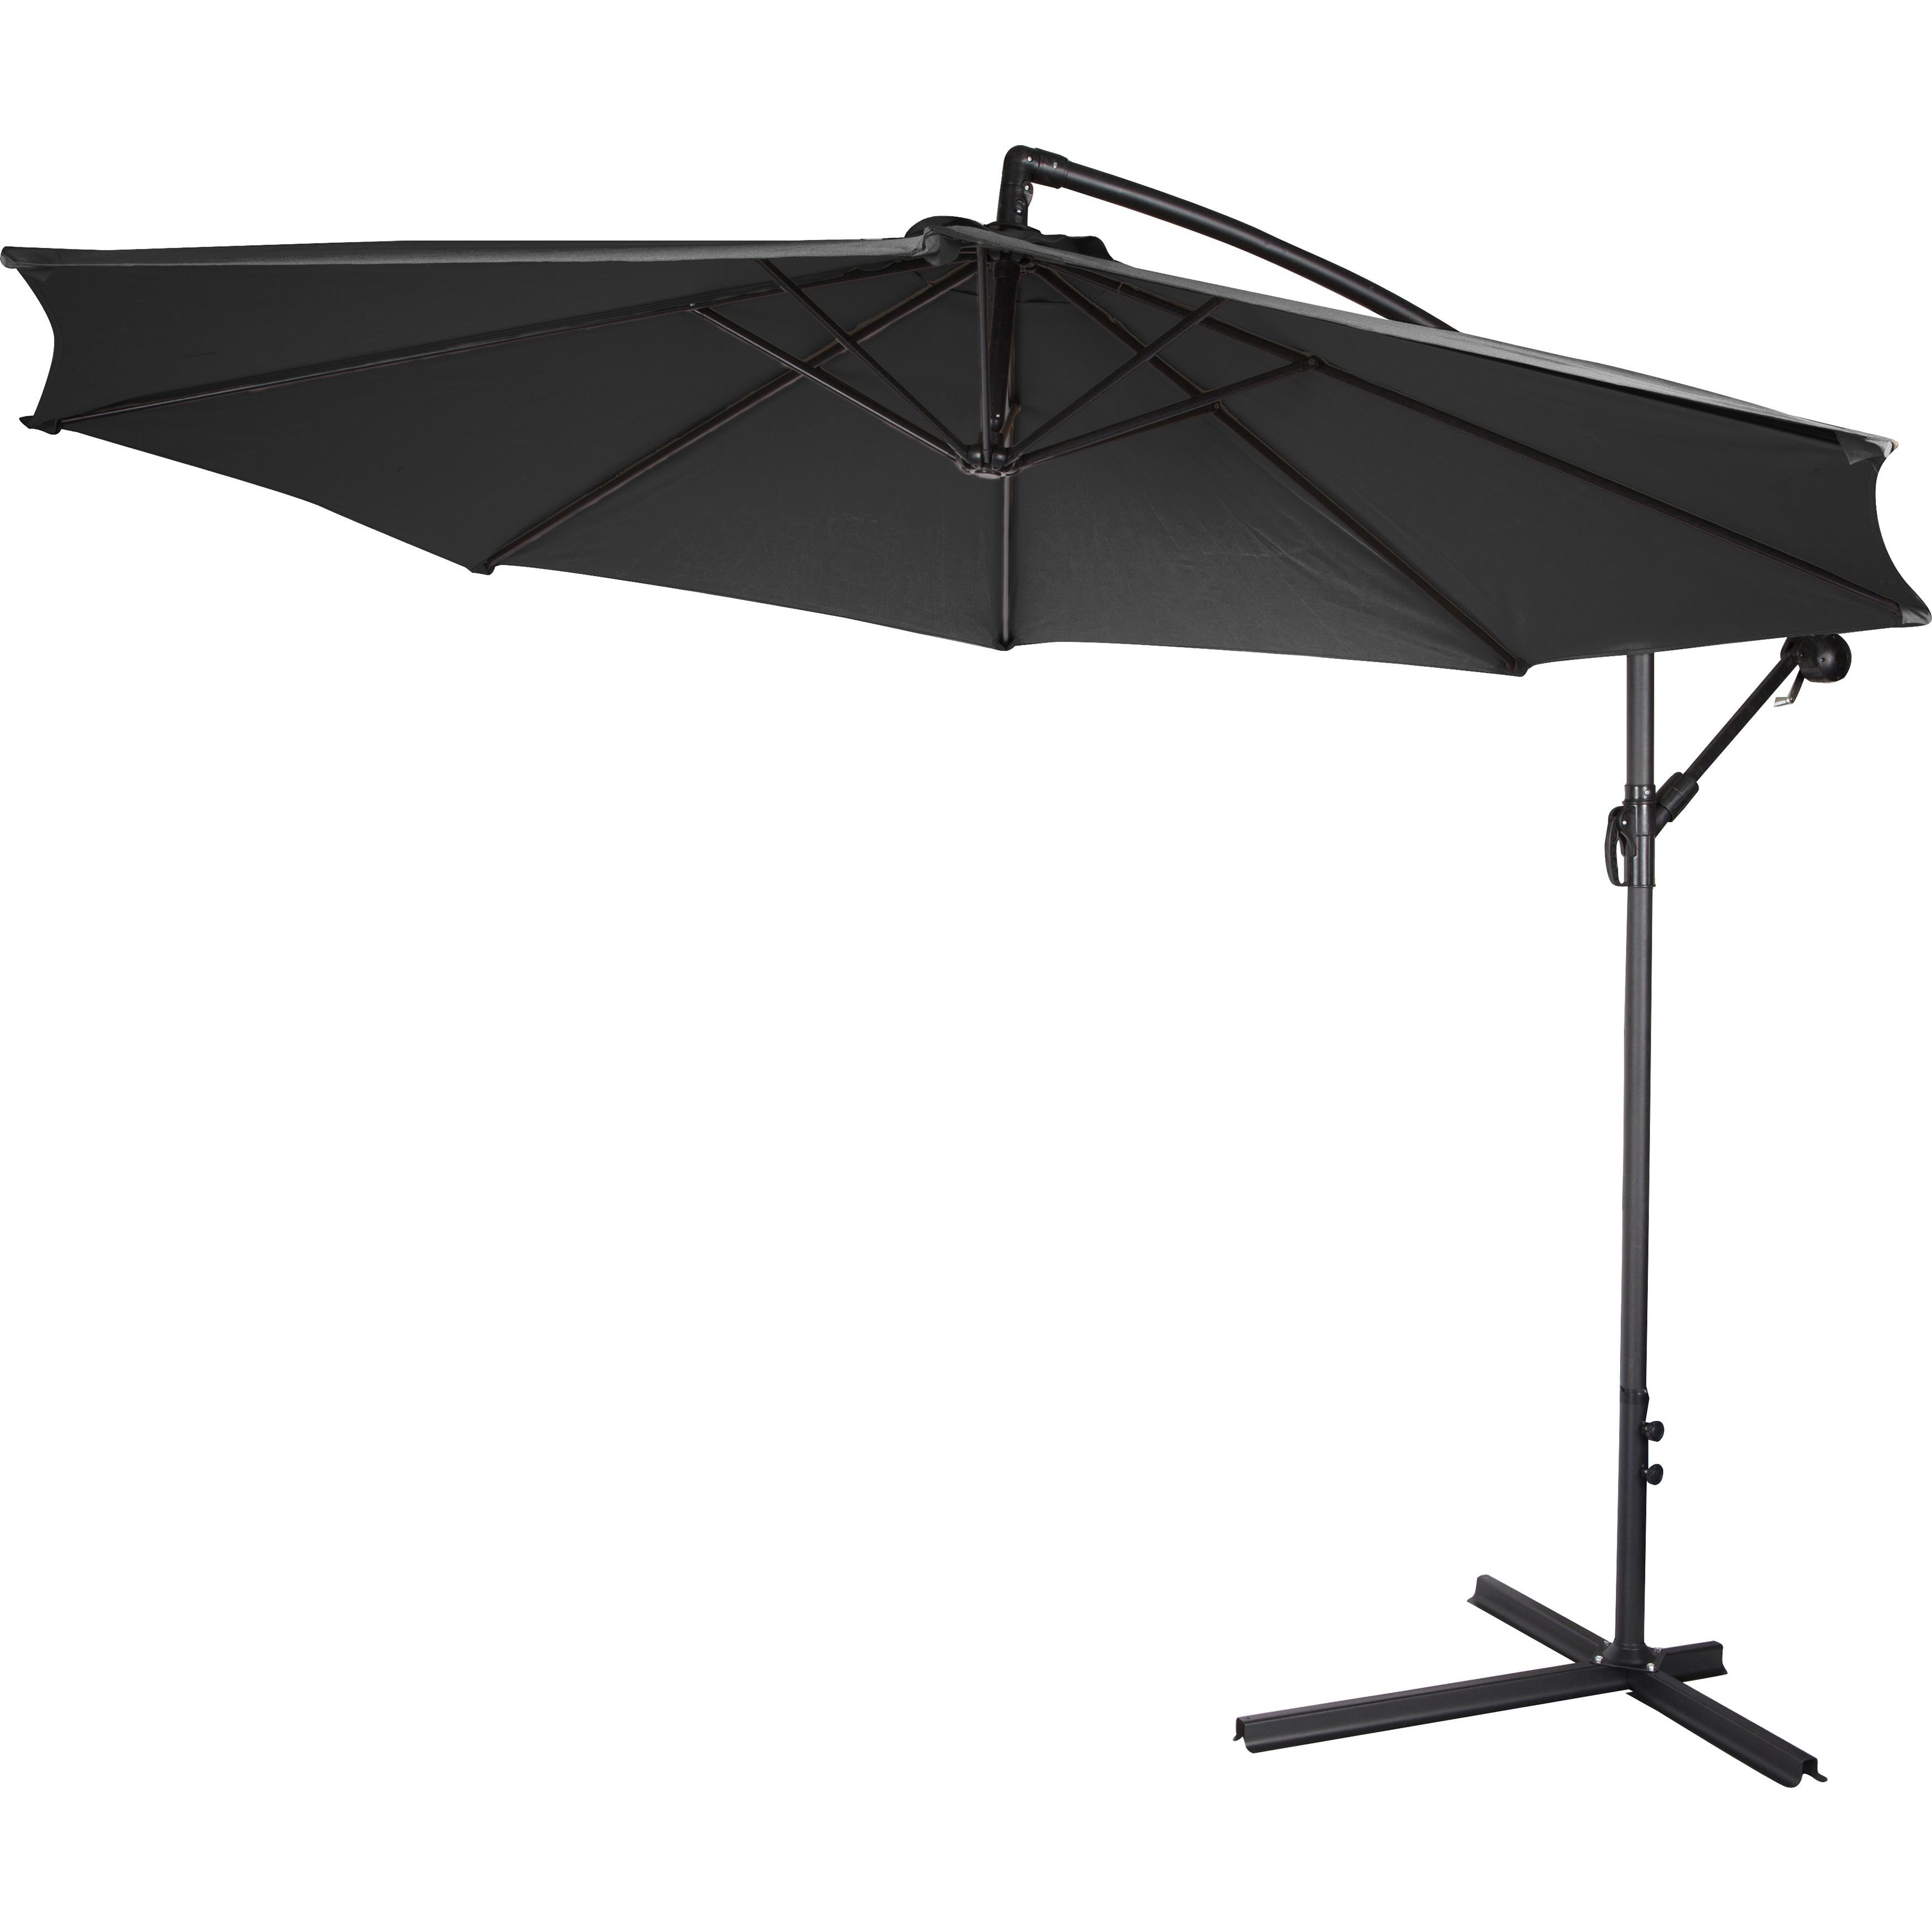 10 inch Deluxe Polyester Black fset Patio Umbrella Free